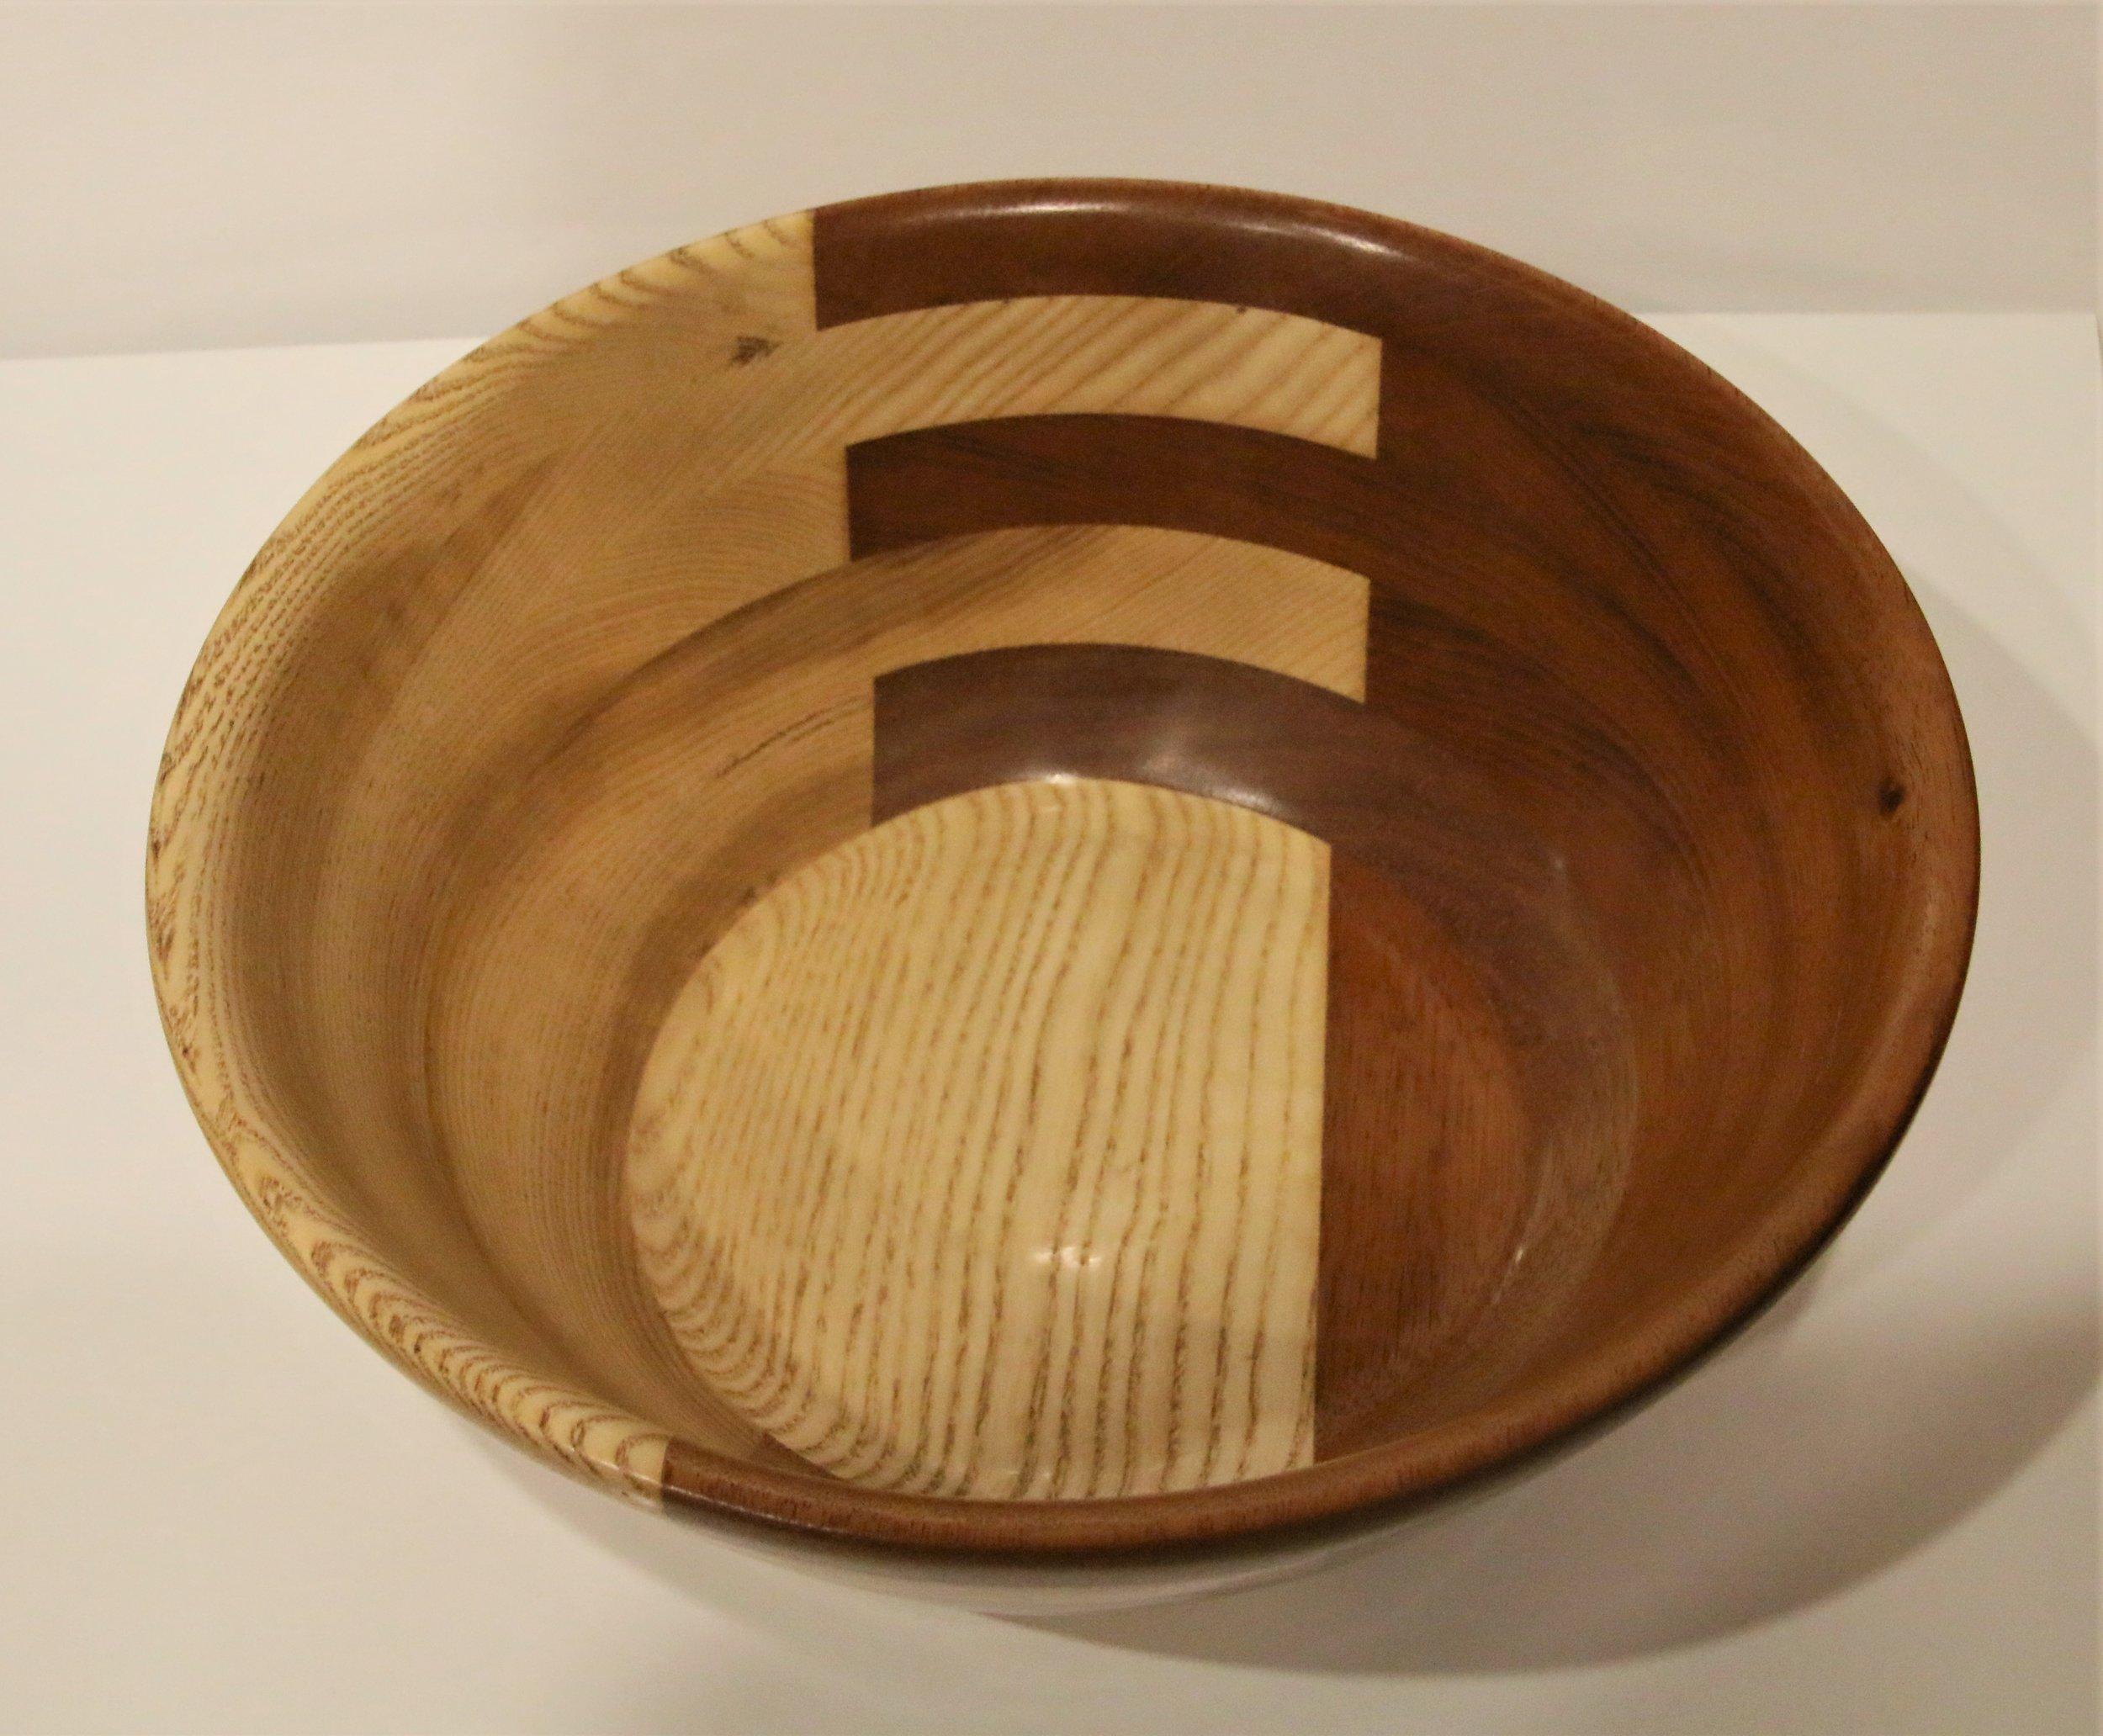 Medium Bowl - American Ash, Brazilian Maple